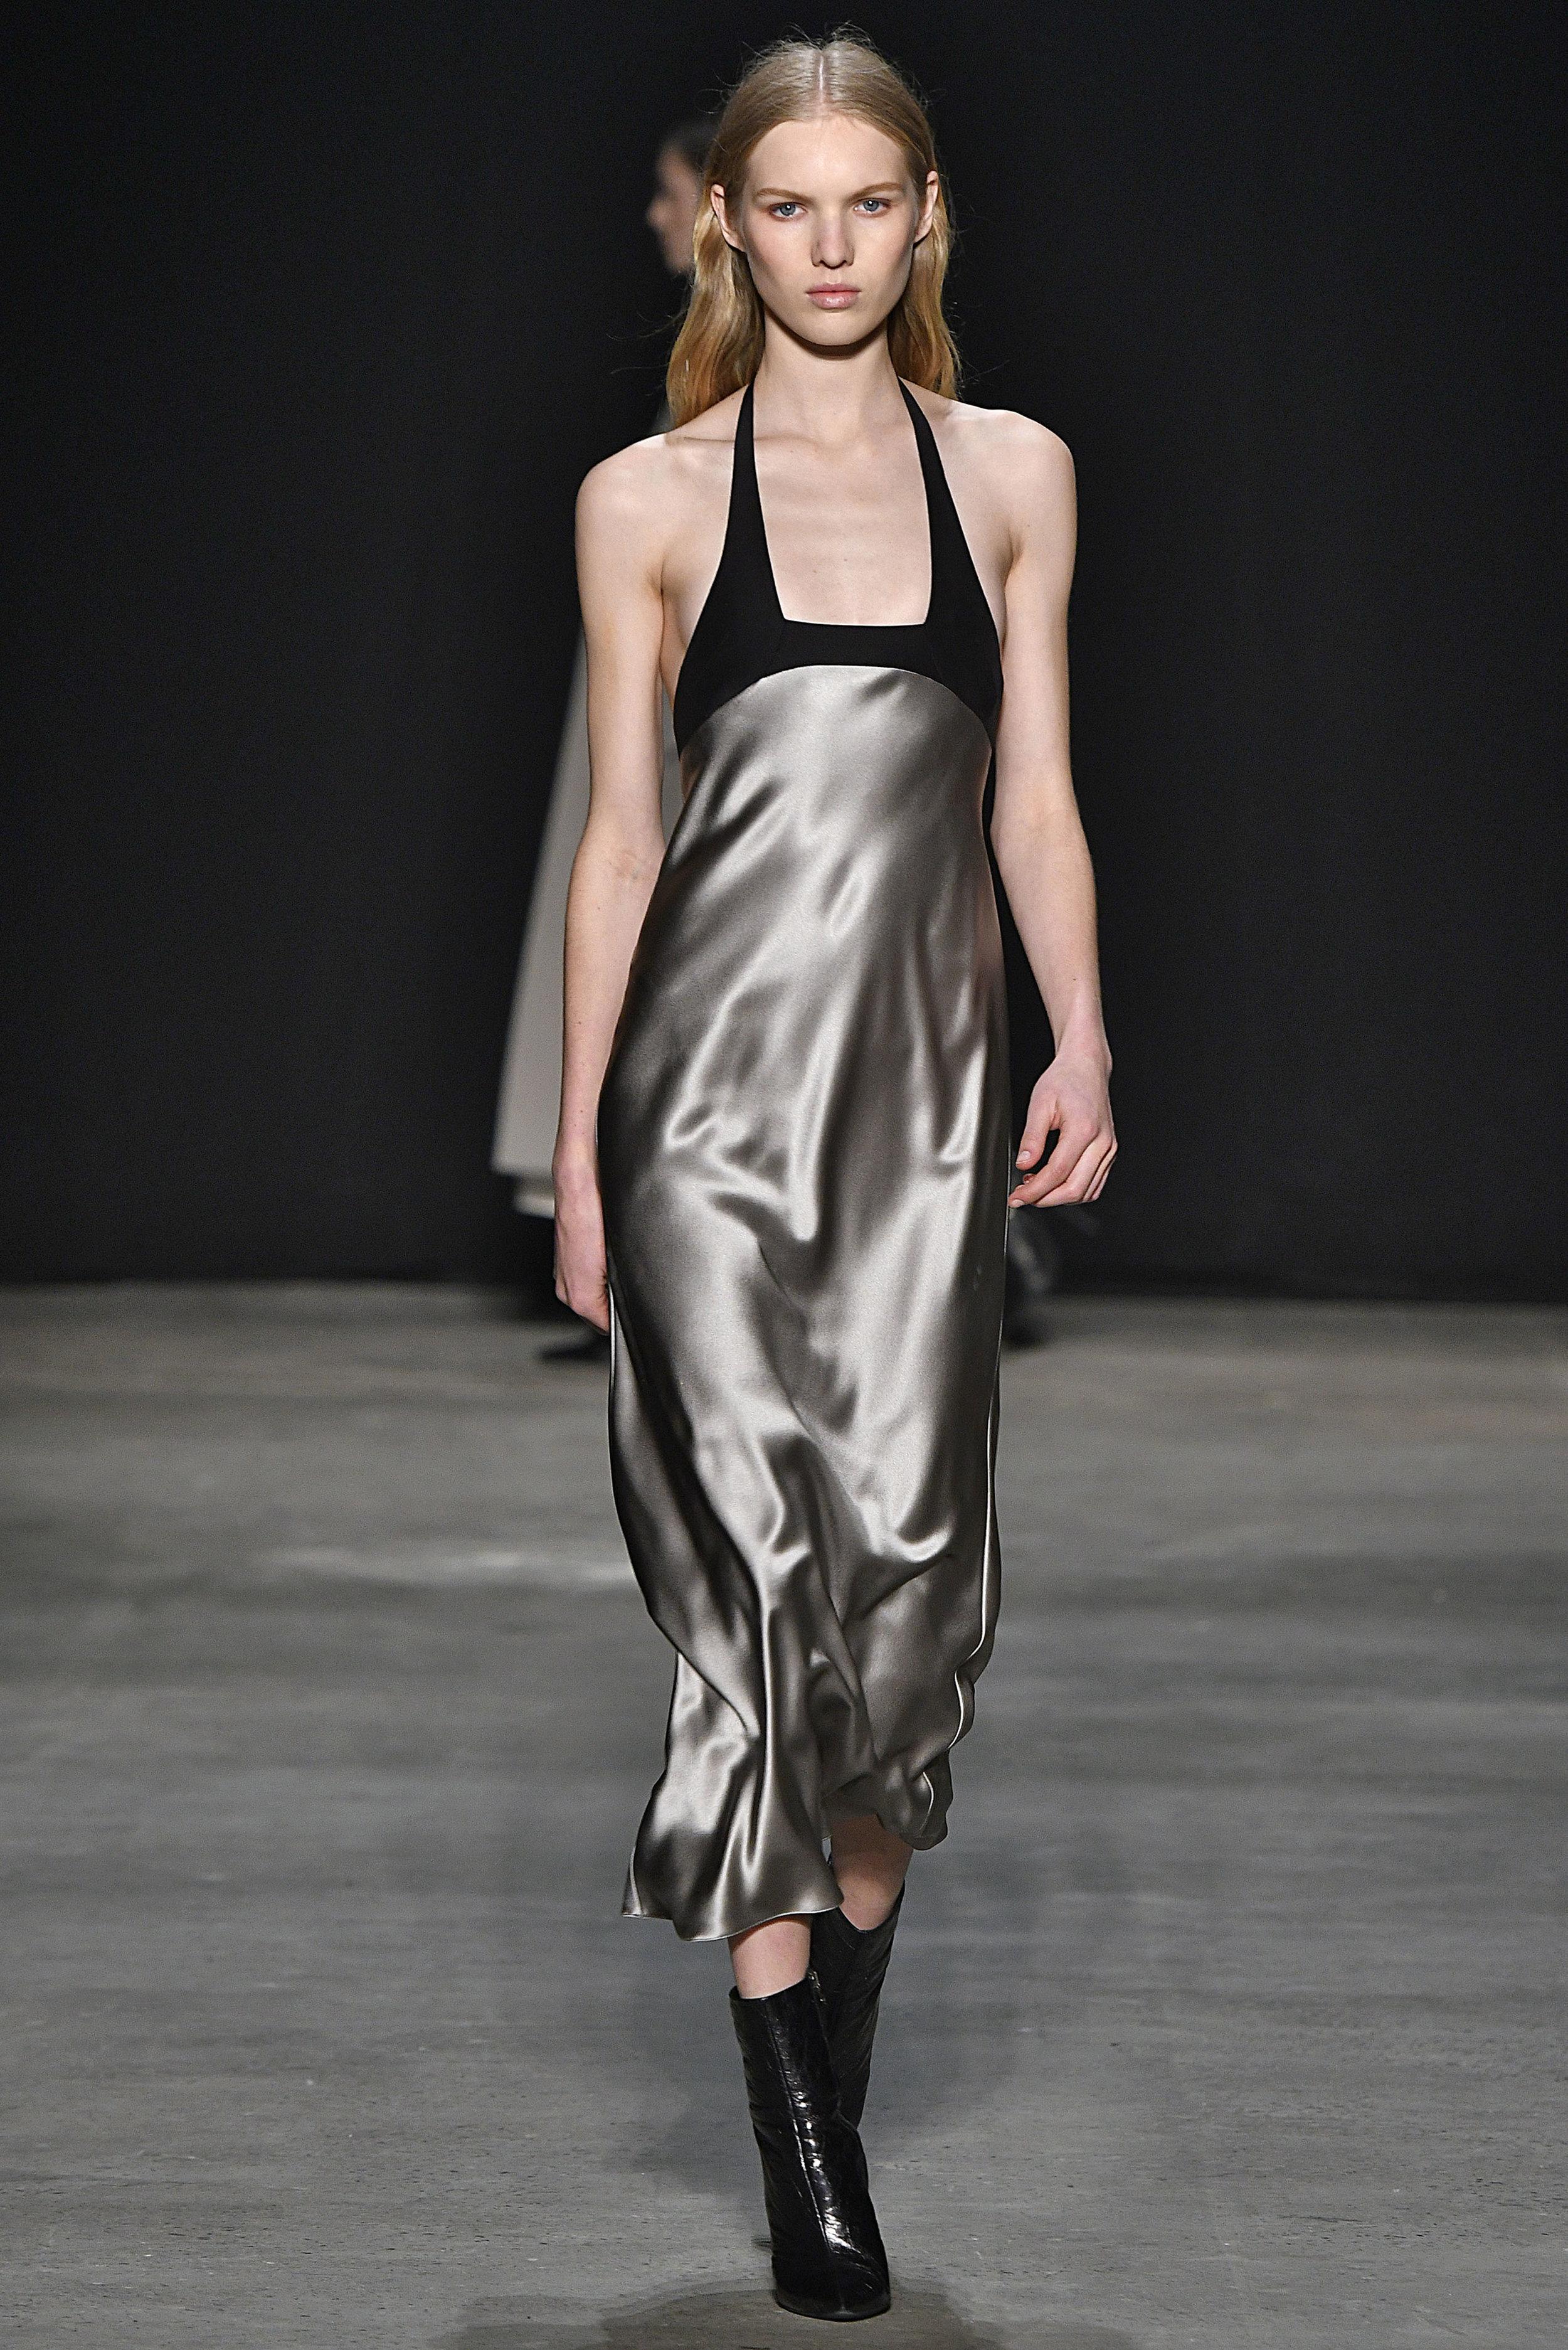 Narciso Rodriguez Fall 2017 collection. Khaki/black silk dress.